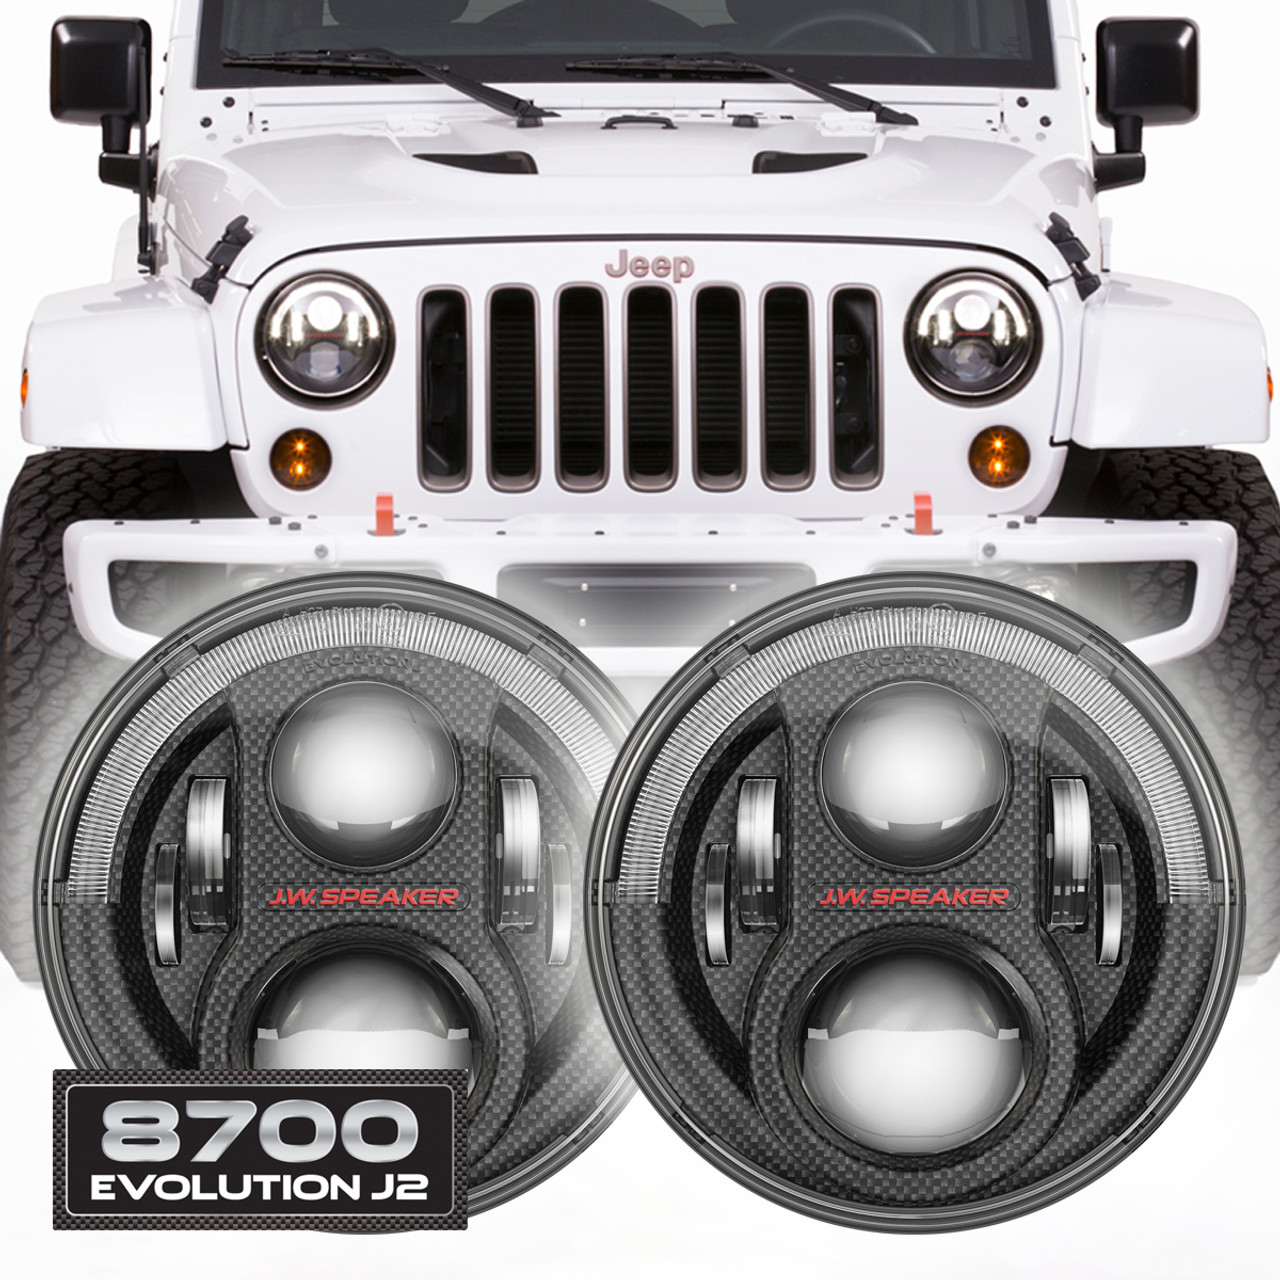 Jw Speaker 8700 Evolution J2 Jeep Wrangler Led Headlights